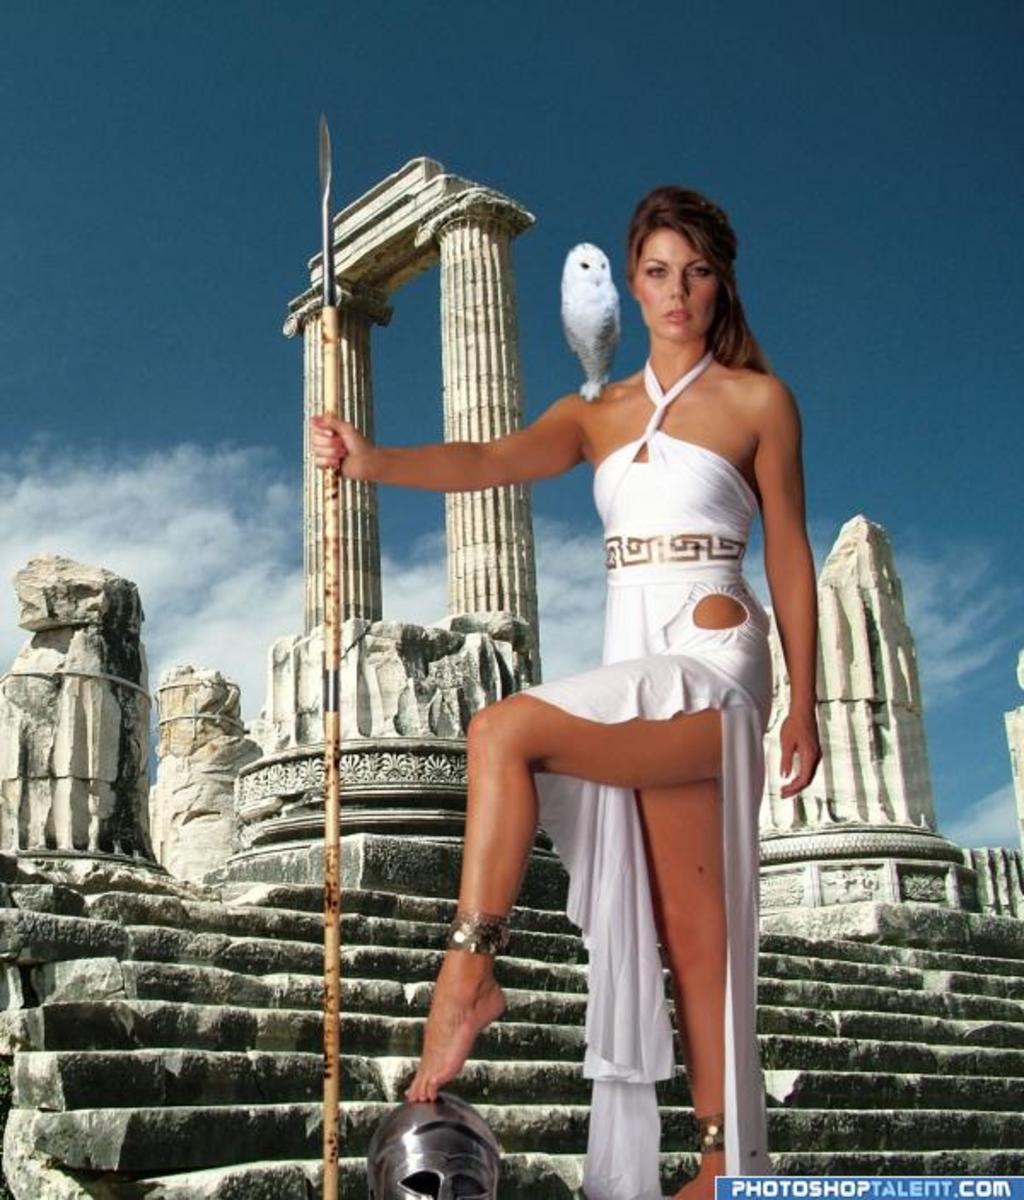 Athena Goddess of Wisdom and War!